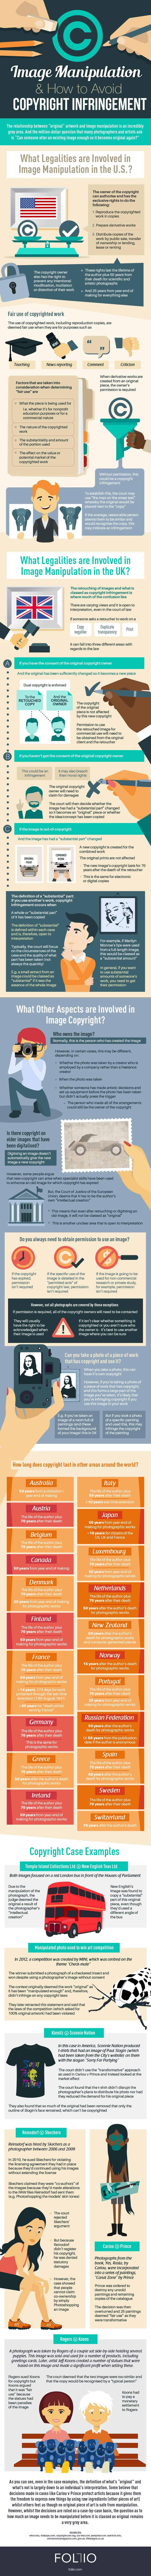 Image Manipulation & How to Avoid Copyright Infringement2